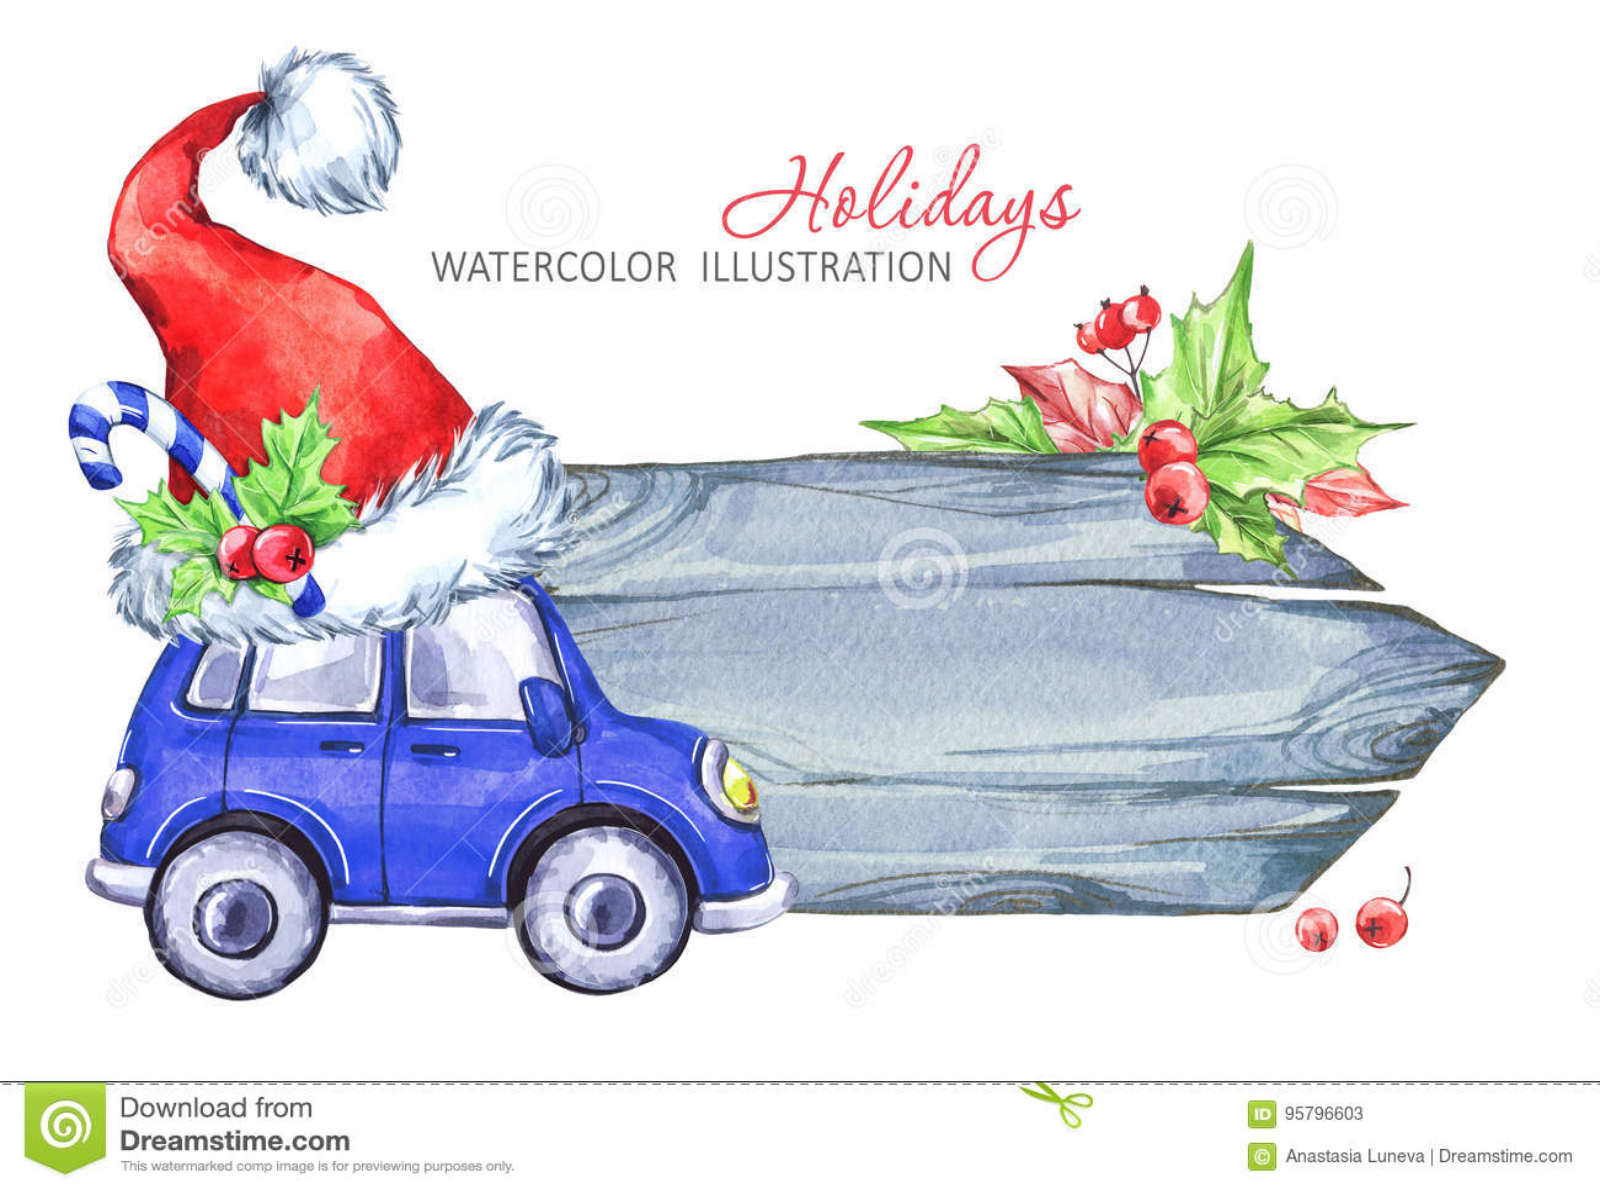 1004959b0d7f3 Winter Watercolor Greeting Card